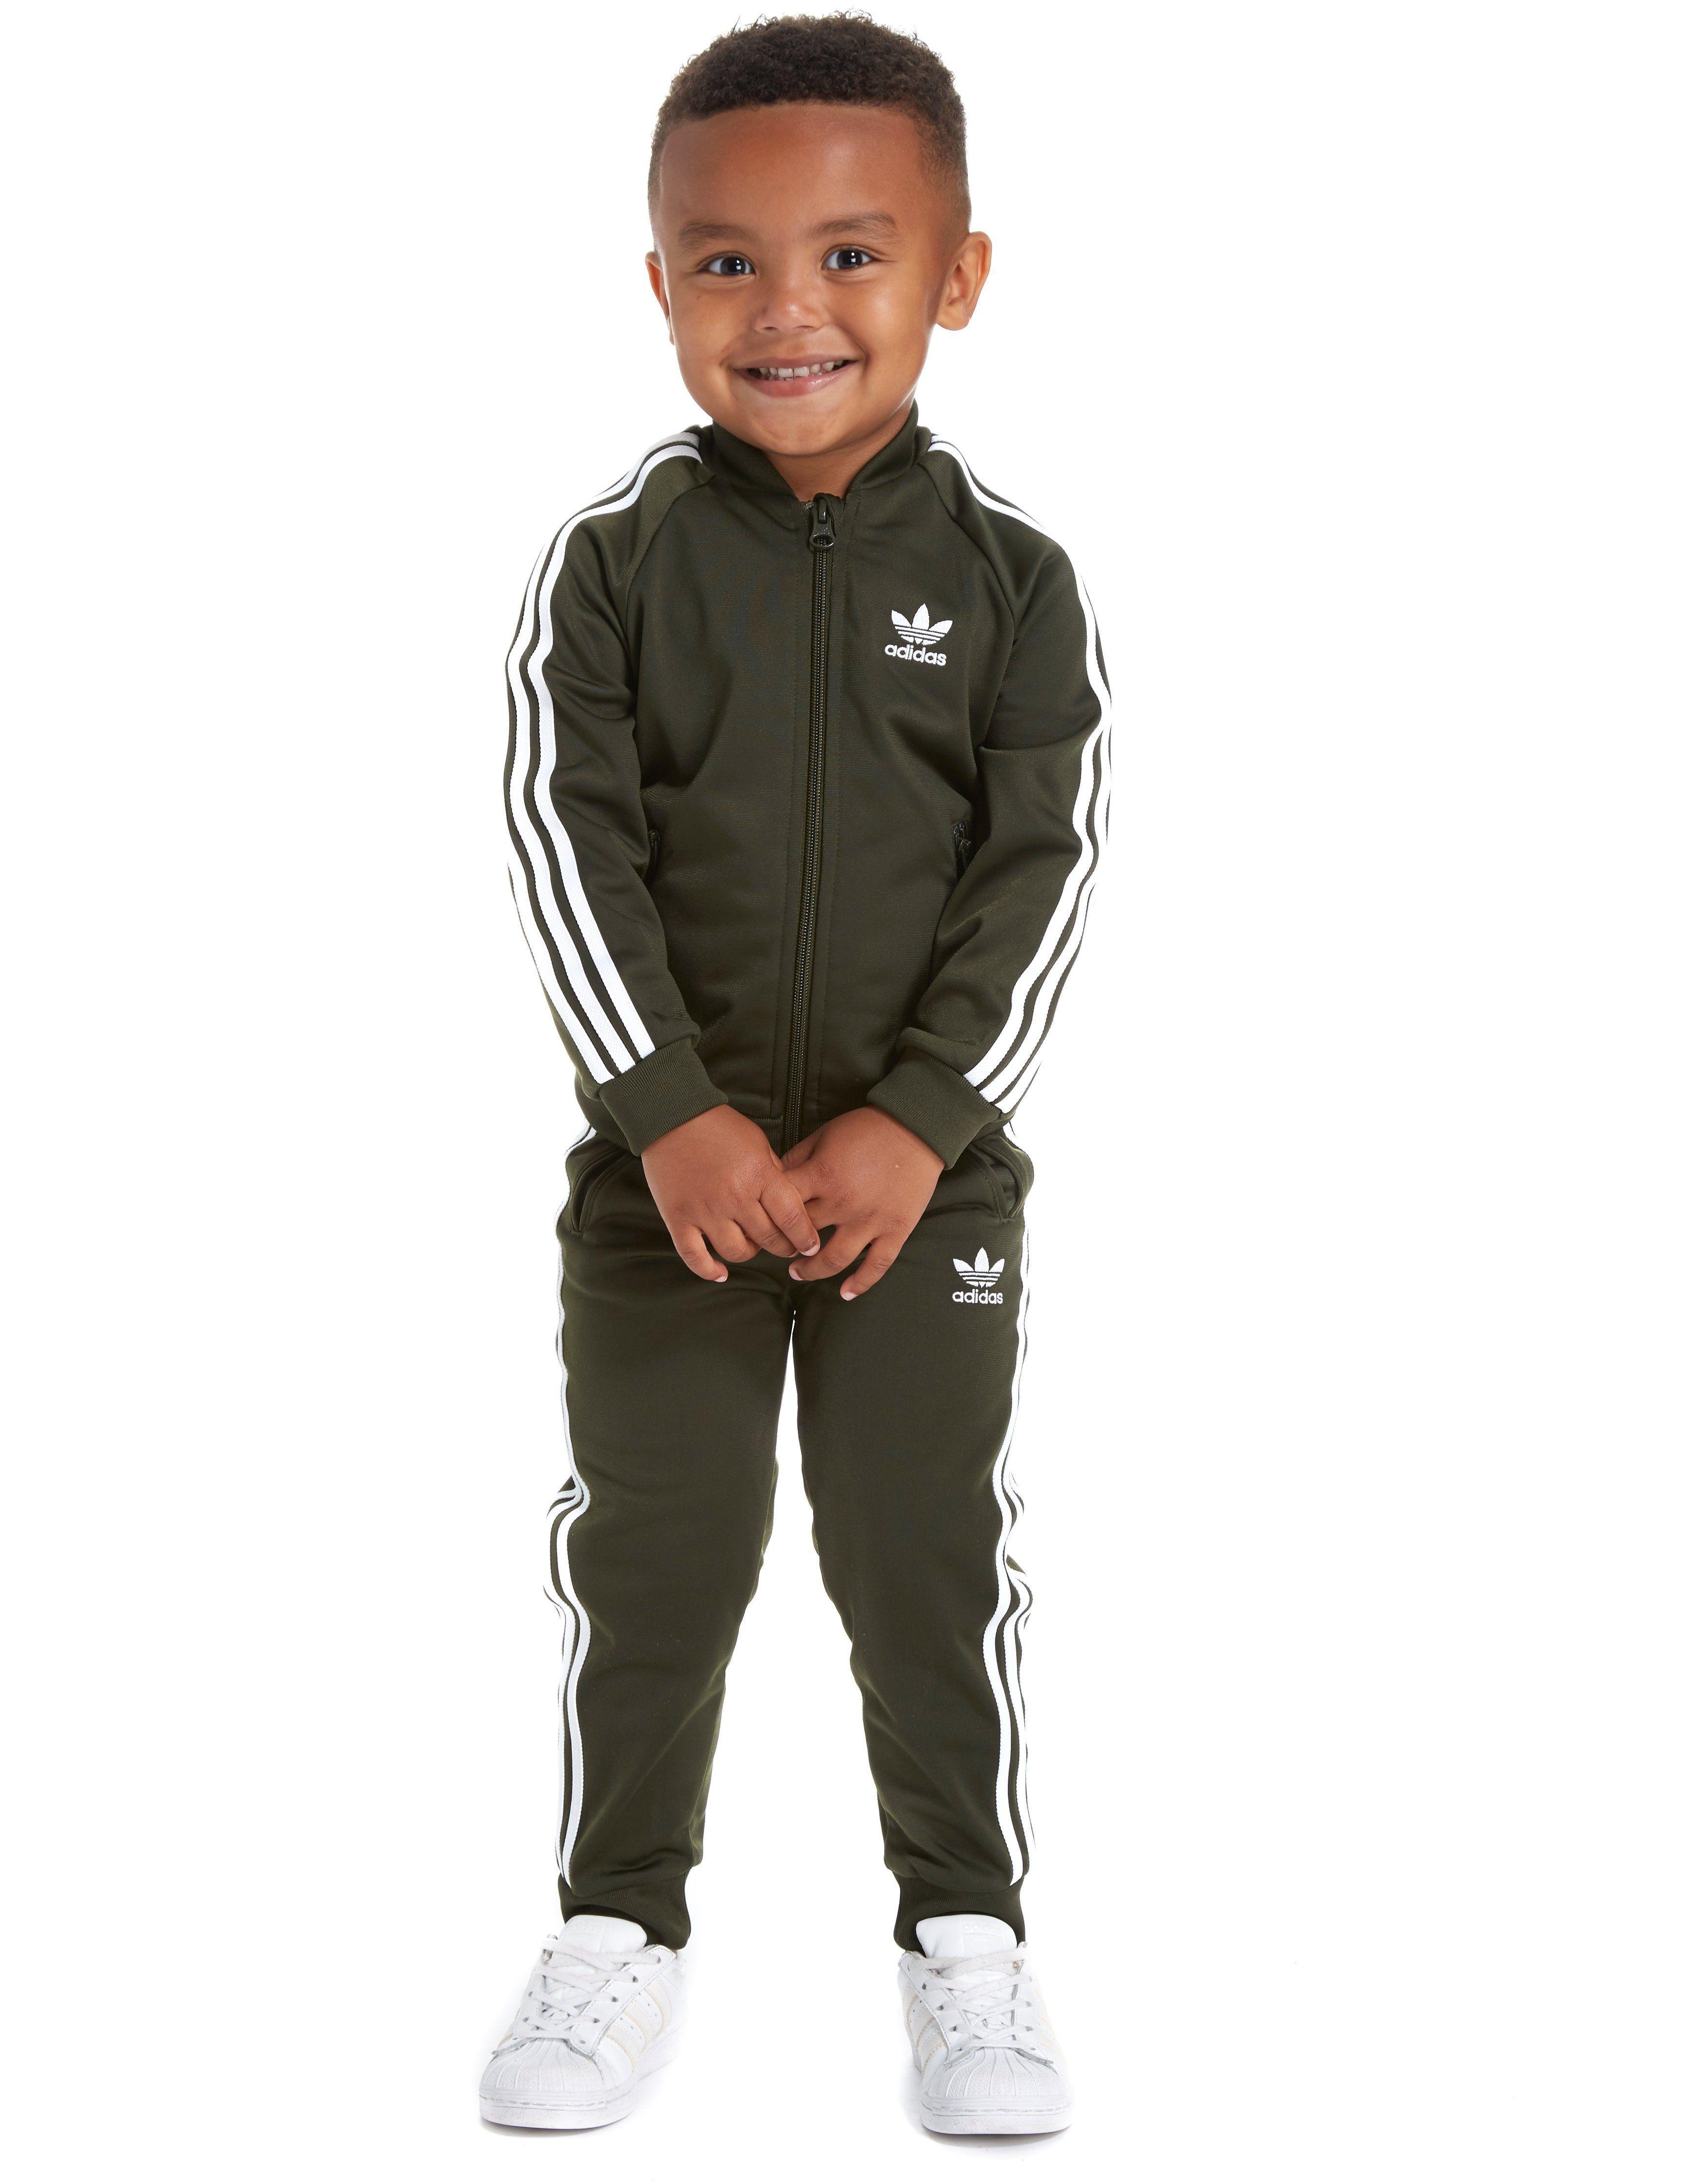 Jd Adidas Originals Sports Superstar Infant Suit giftryapp IIrW8